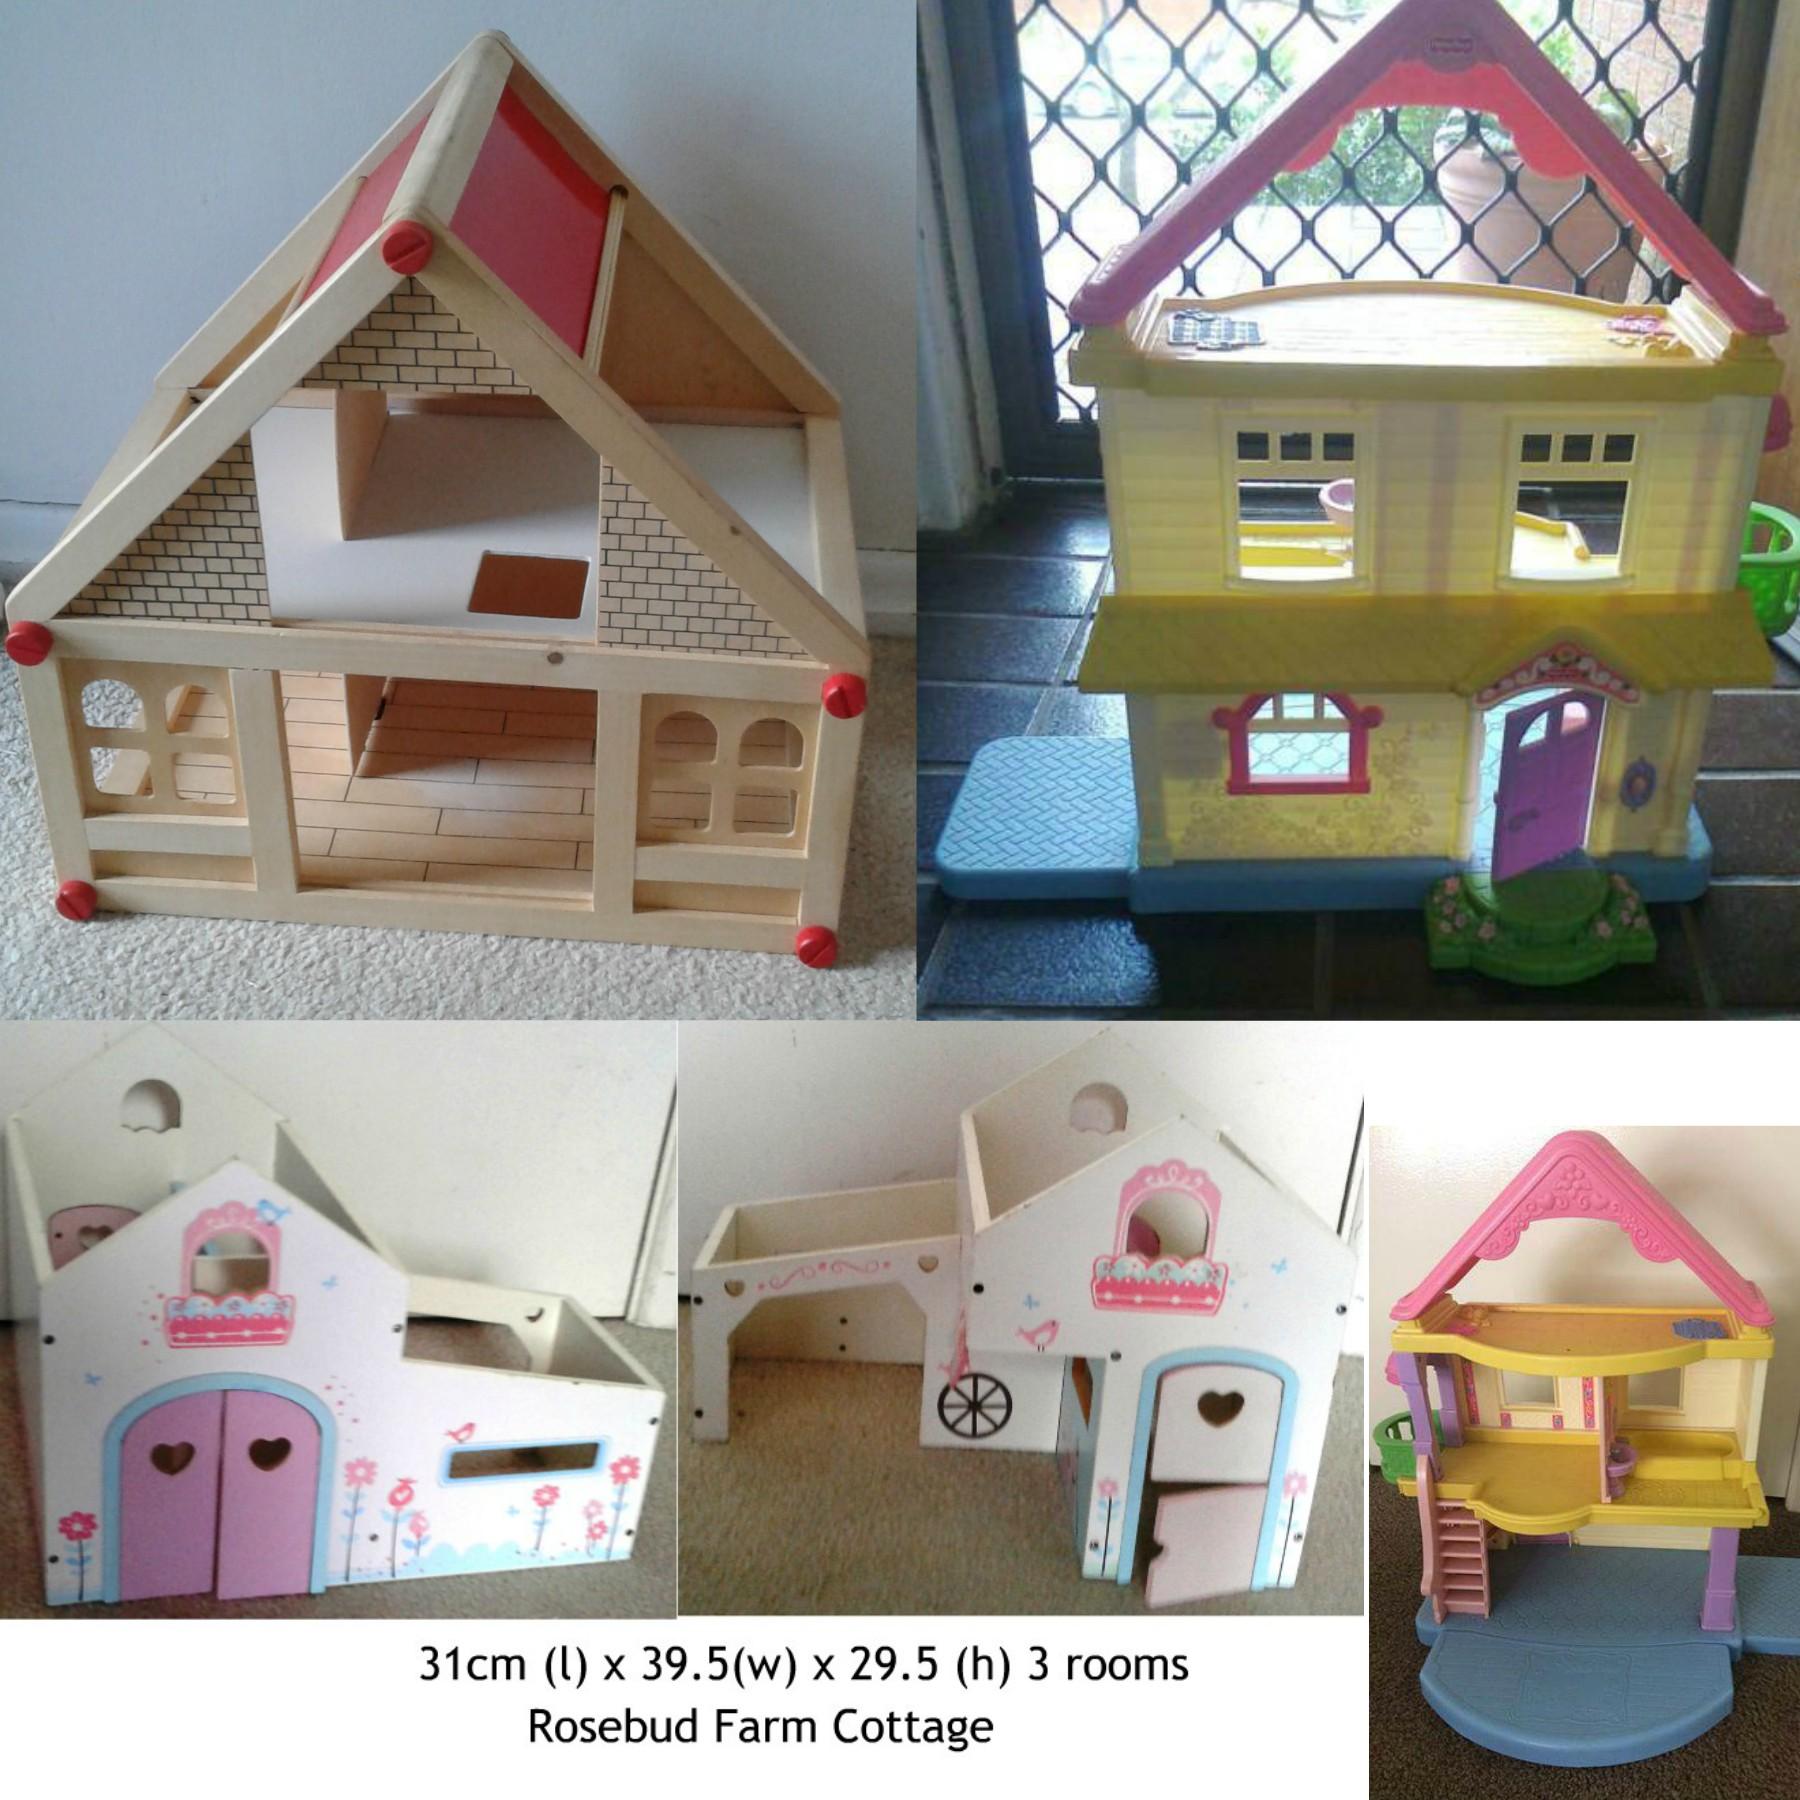 Dollhouses 2 Floor Dollhouse – Fisher Price My First Dollhouse – Rosebud Farm Cottage – Furniture